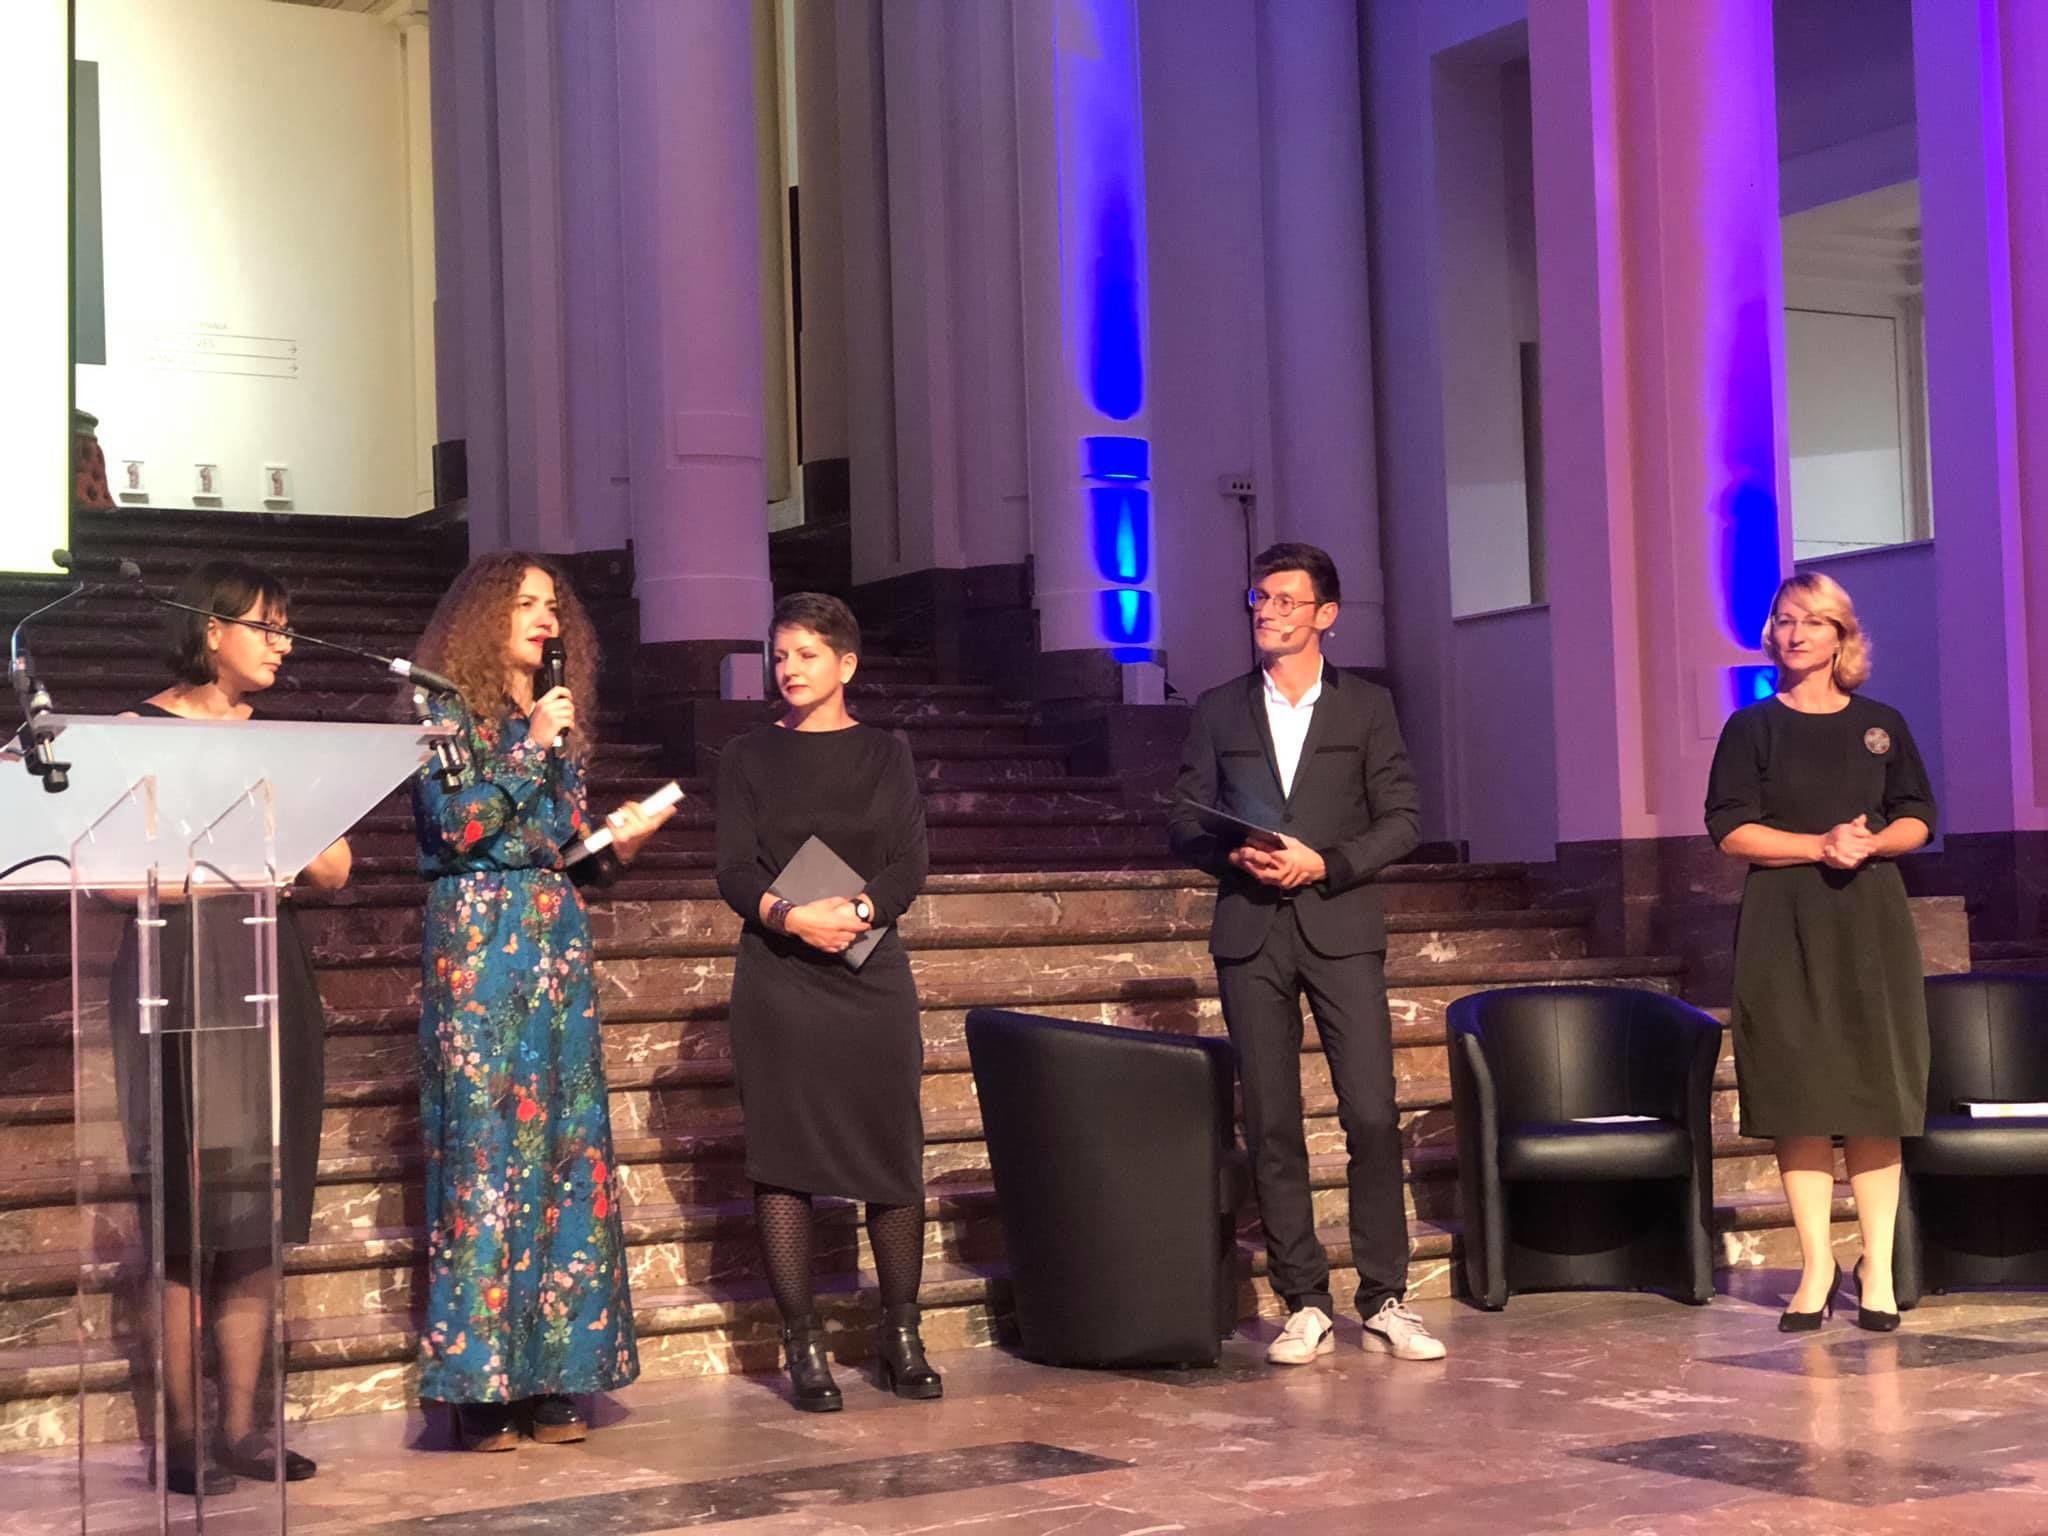 Гаська Шиян перемогла European Union Prize for Literature 3 жовтня 2019